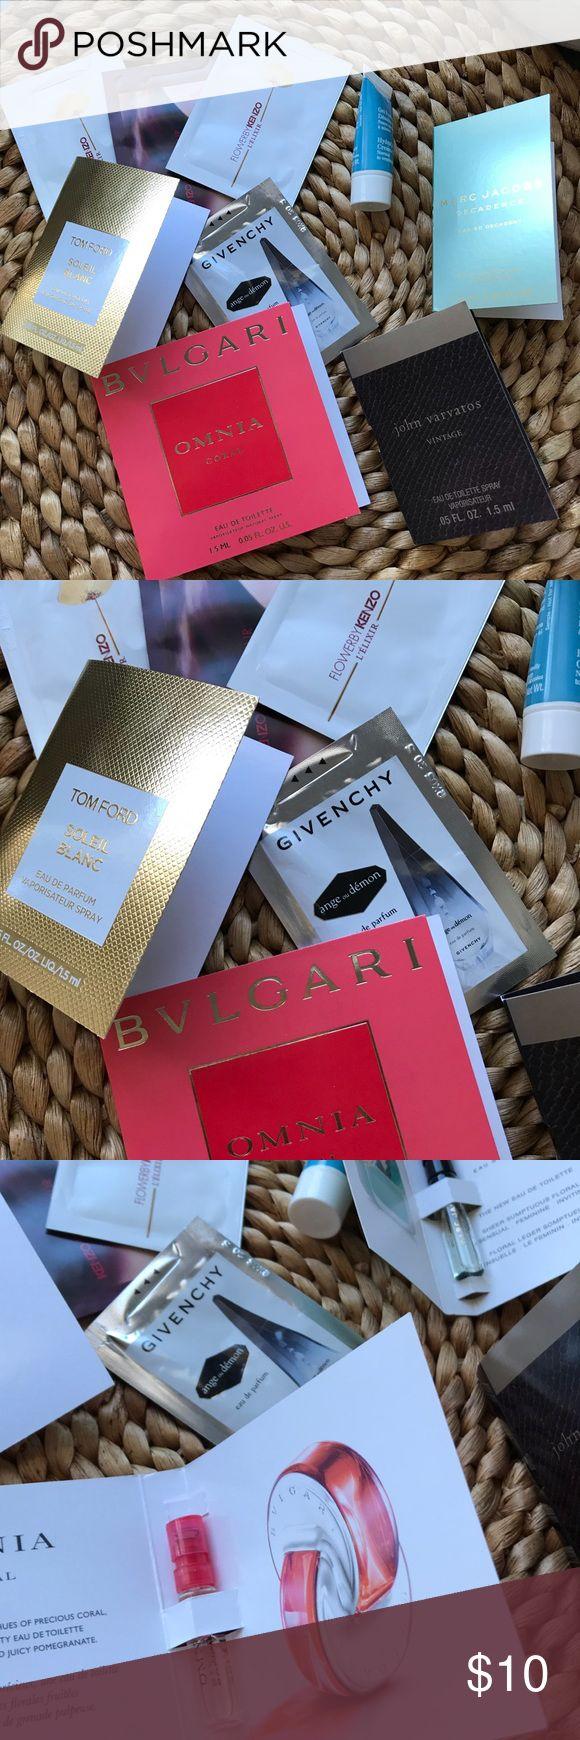 ▪️Bundle sample▪️ I'm selling sample fragrances never used  -BVLGARI omnia ( $1.50) -TOM FORD soleil blanc ($2) -MARC JACOB decadence ($2) -2 KENZO FLOWERS 🌸 ($1)  -KENZO JEU D'amour  - GIVENCHY ($1) -JOHN VARVATOS  BONUS clarins cream gel Tom Ford Makeup